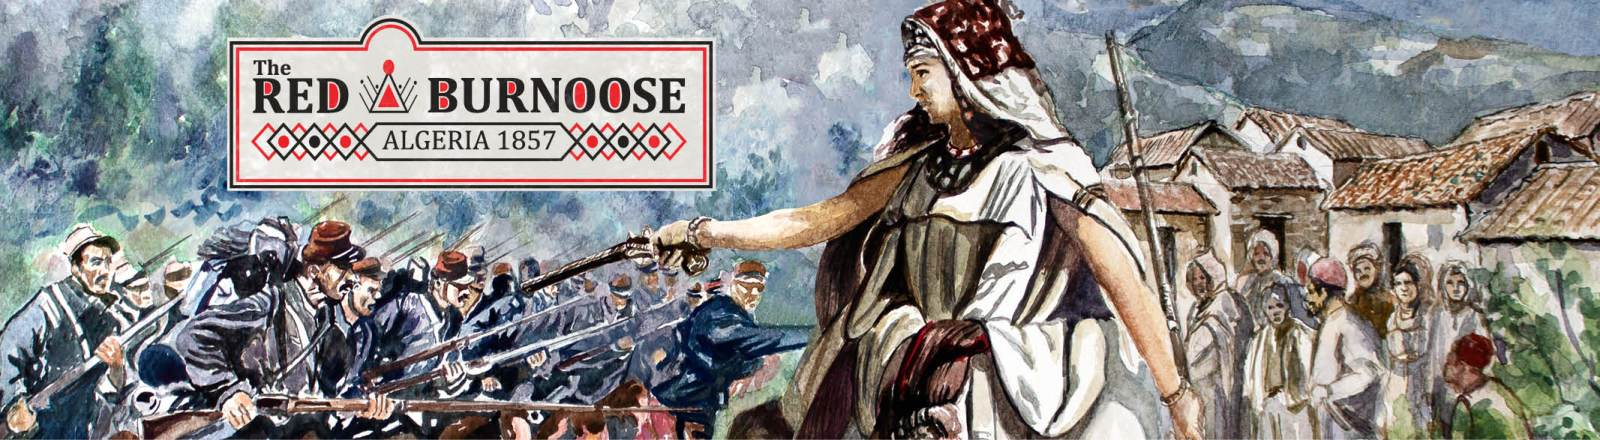 The Red Burnoose Comes to Kickstarter September 14th